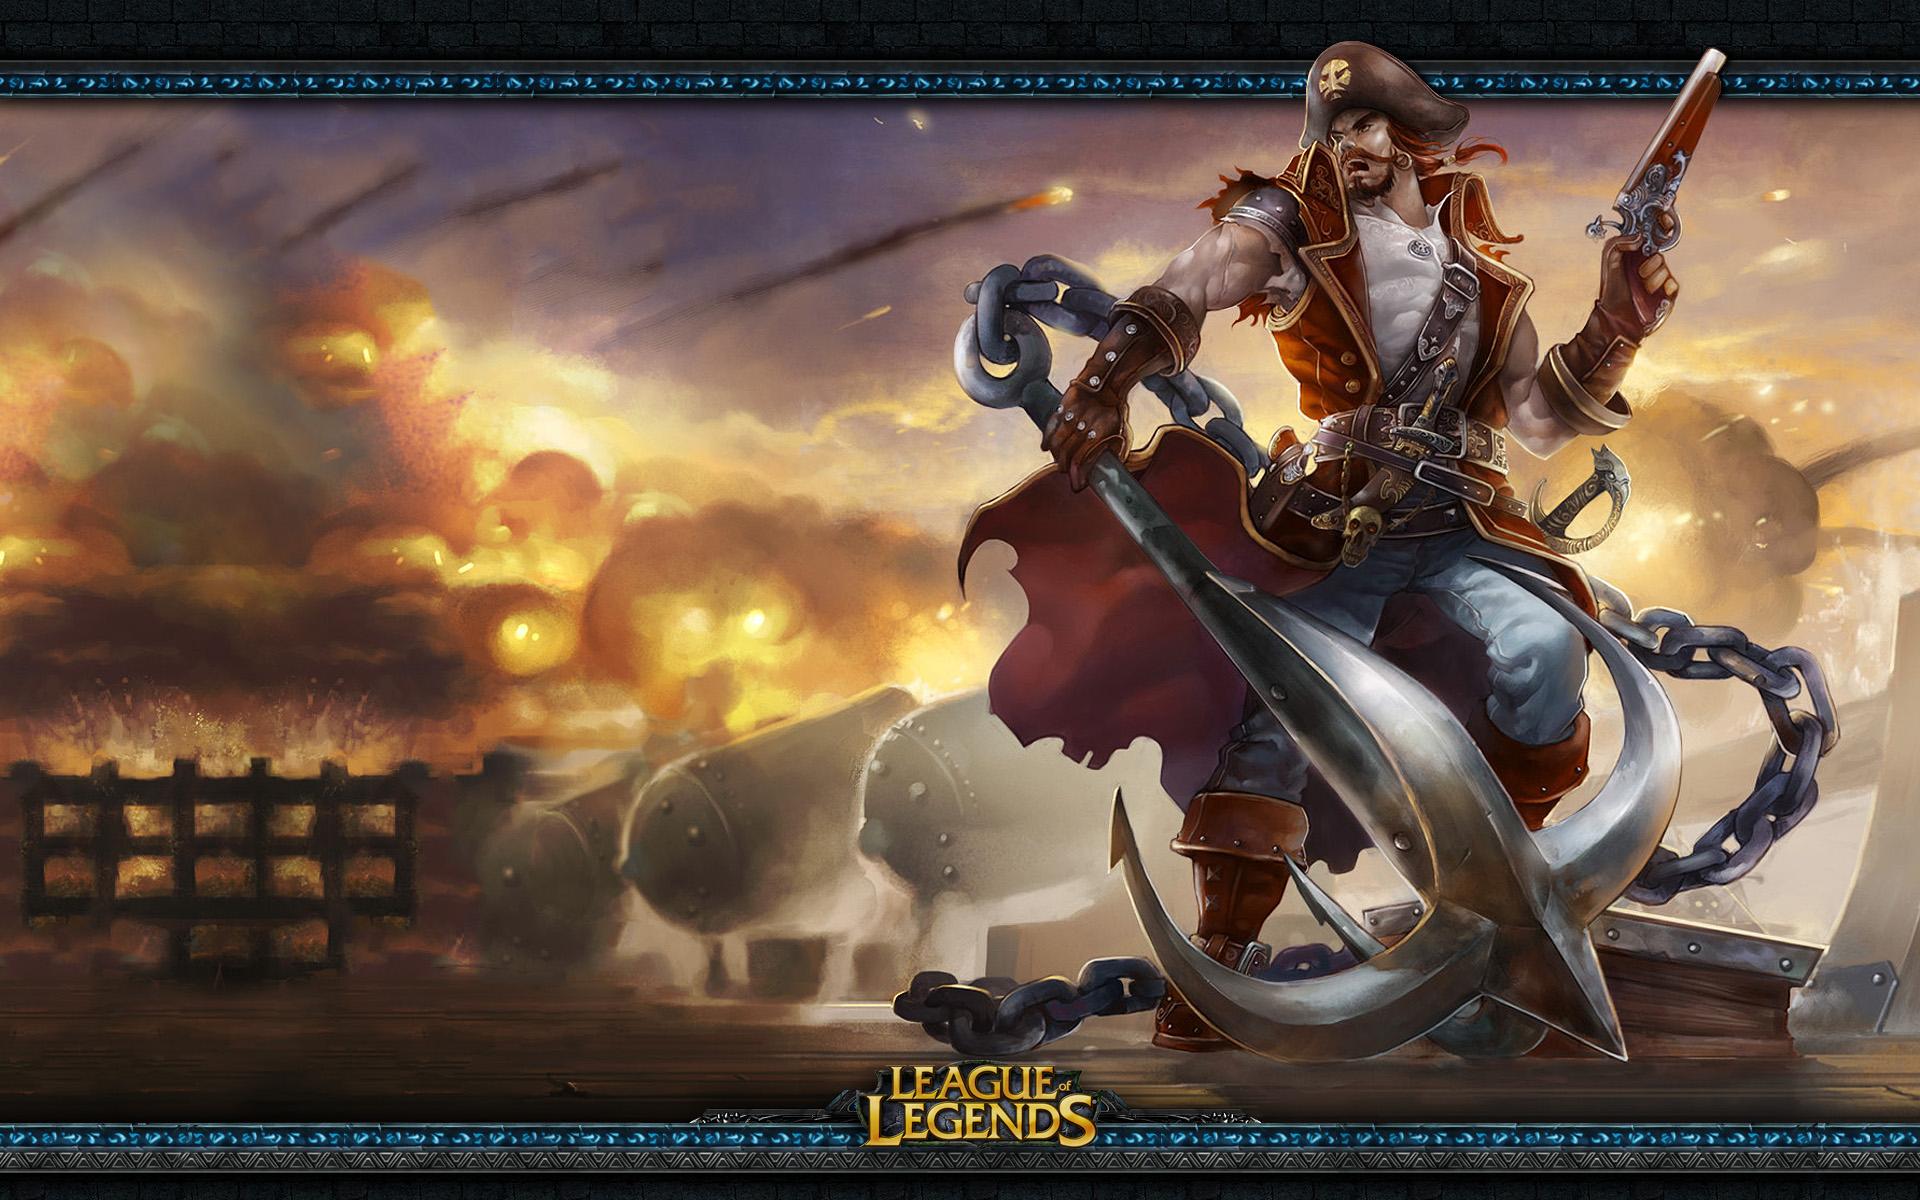 Games / League of Legends: Gang Plank #16984